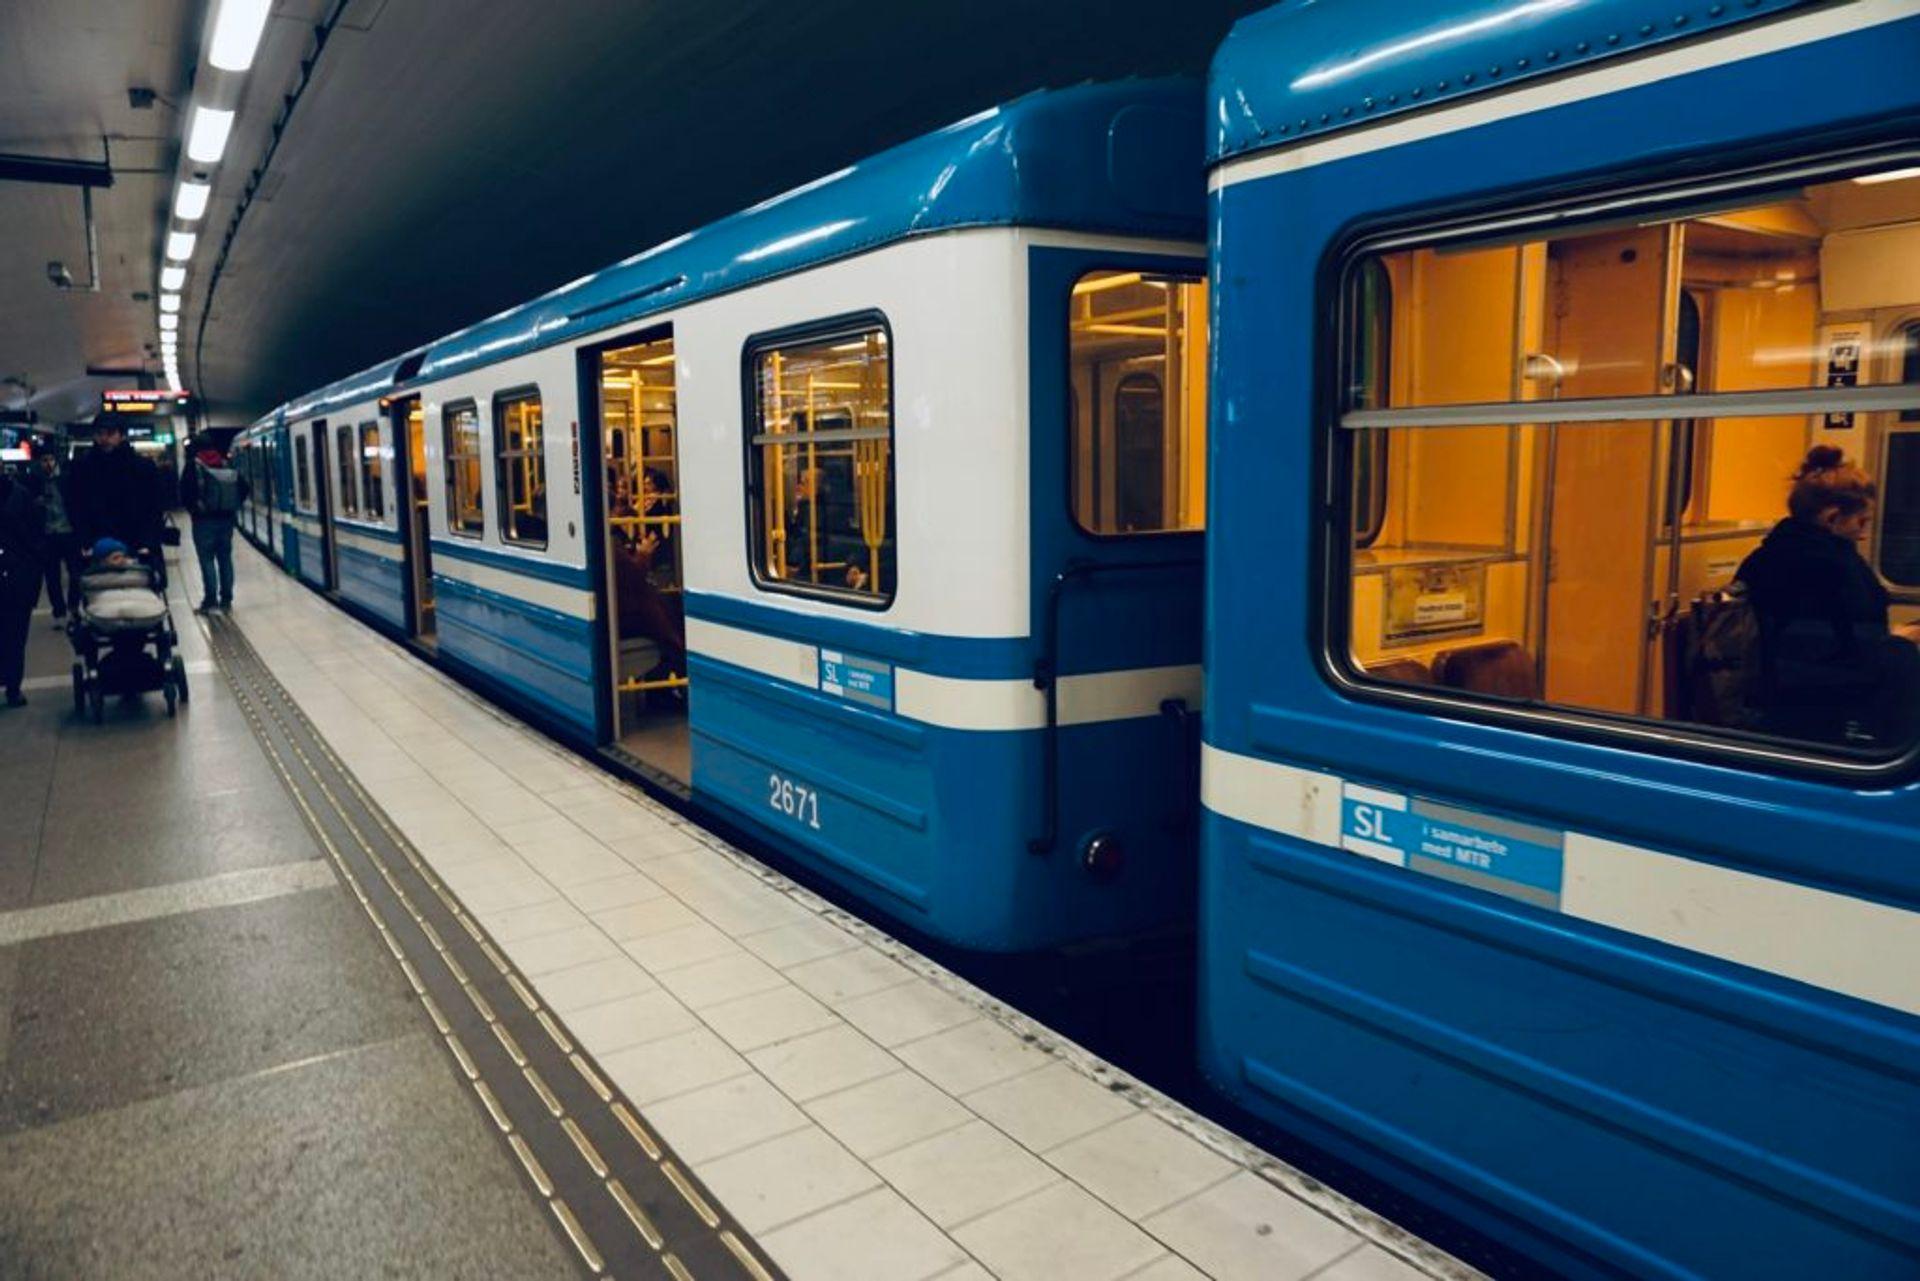 Blue metro trains waiting at a metro station.